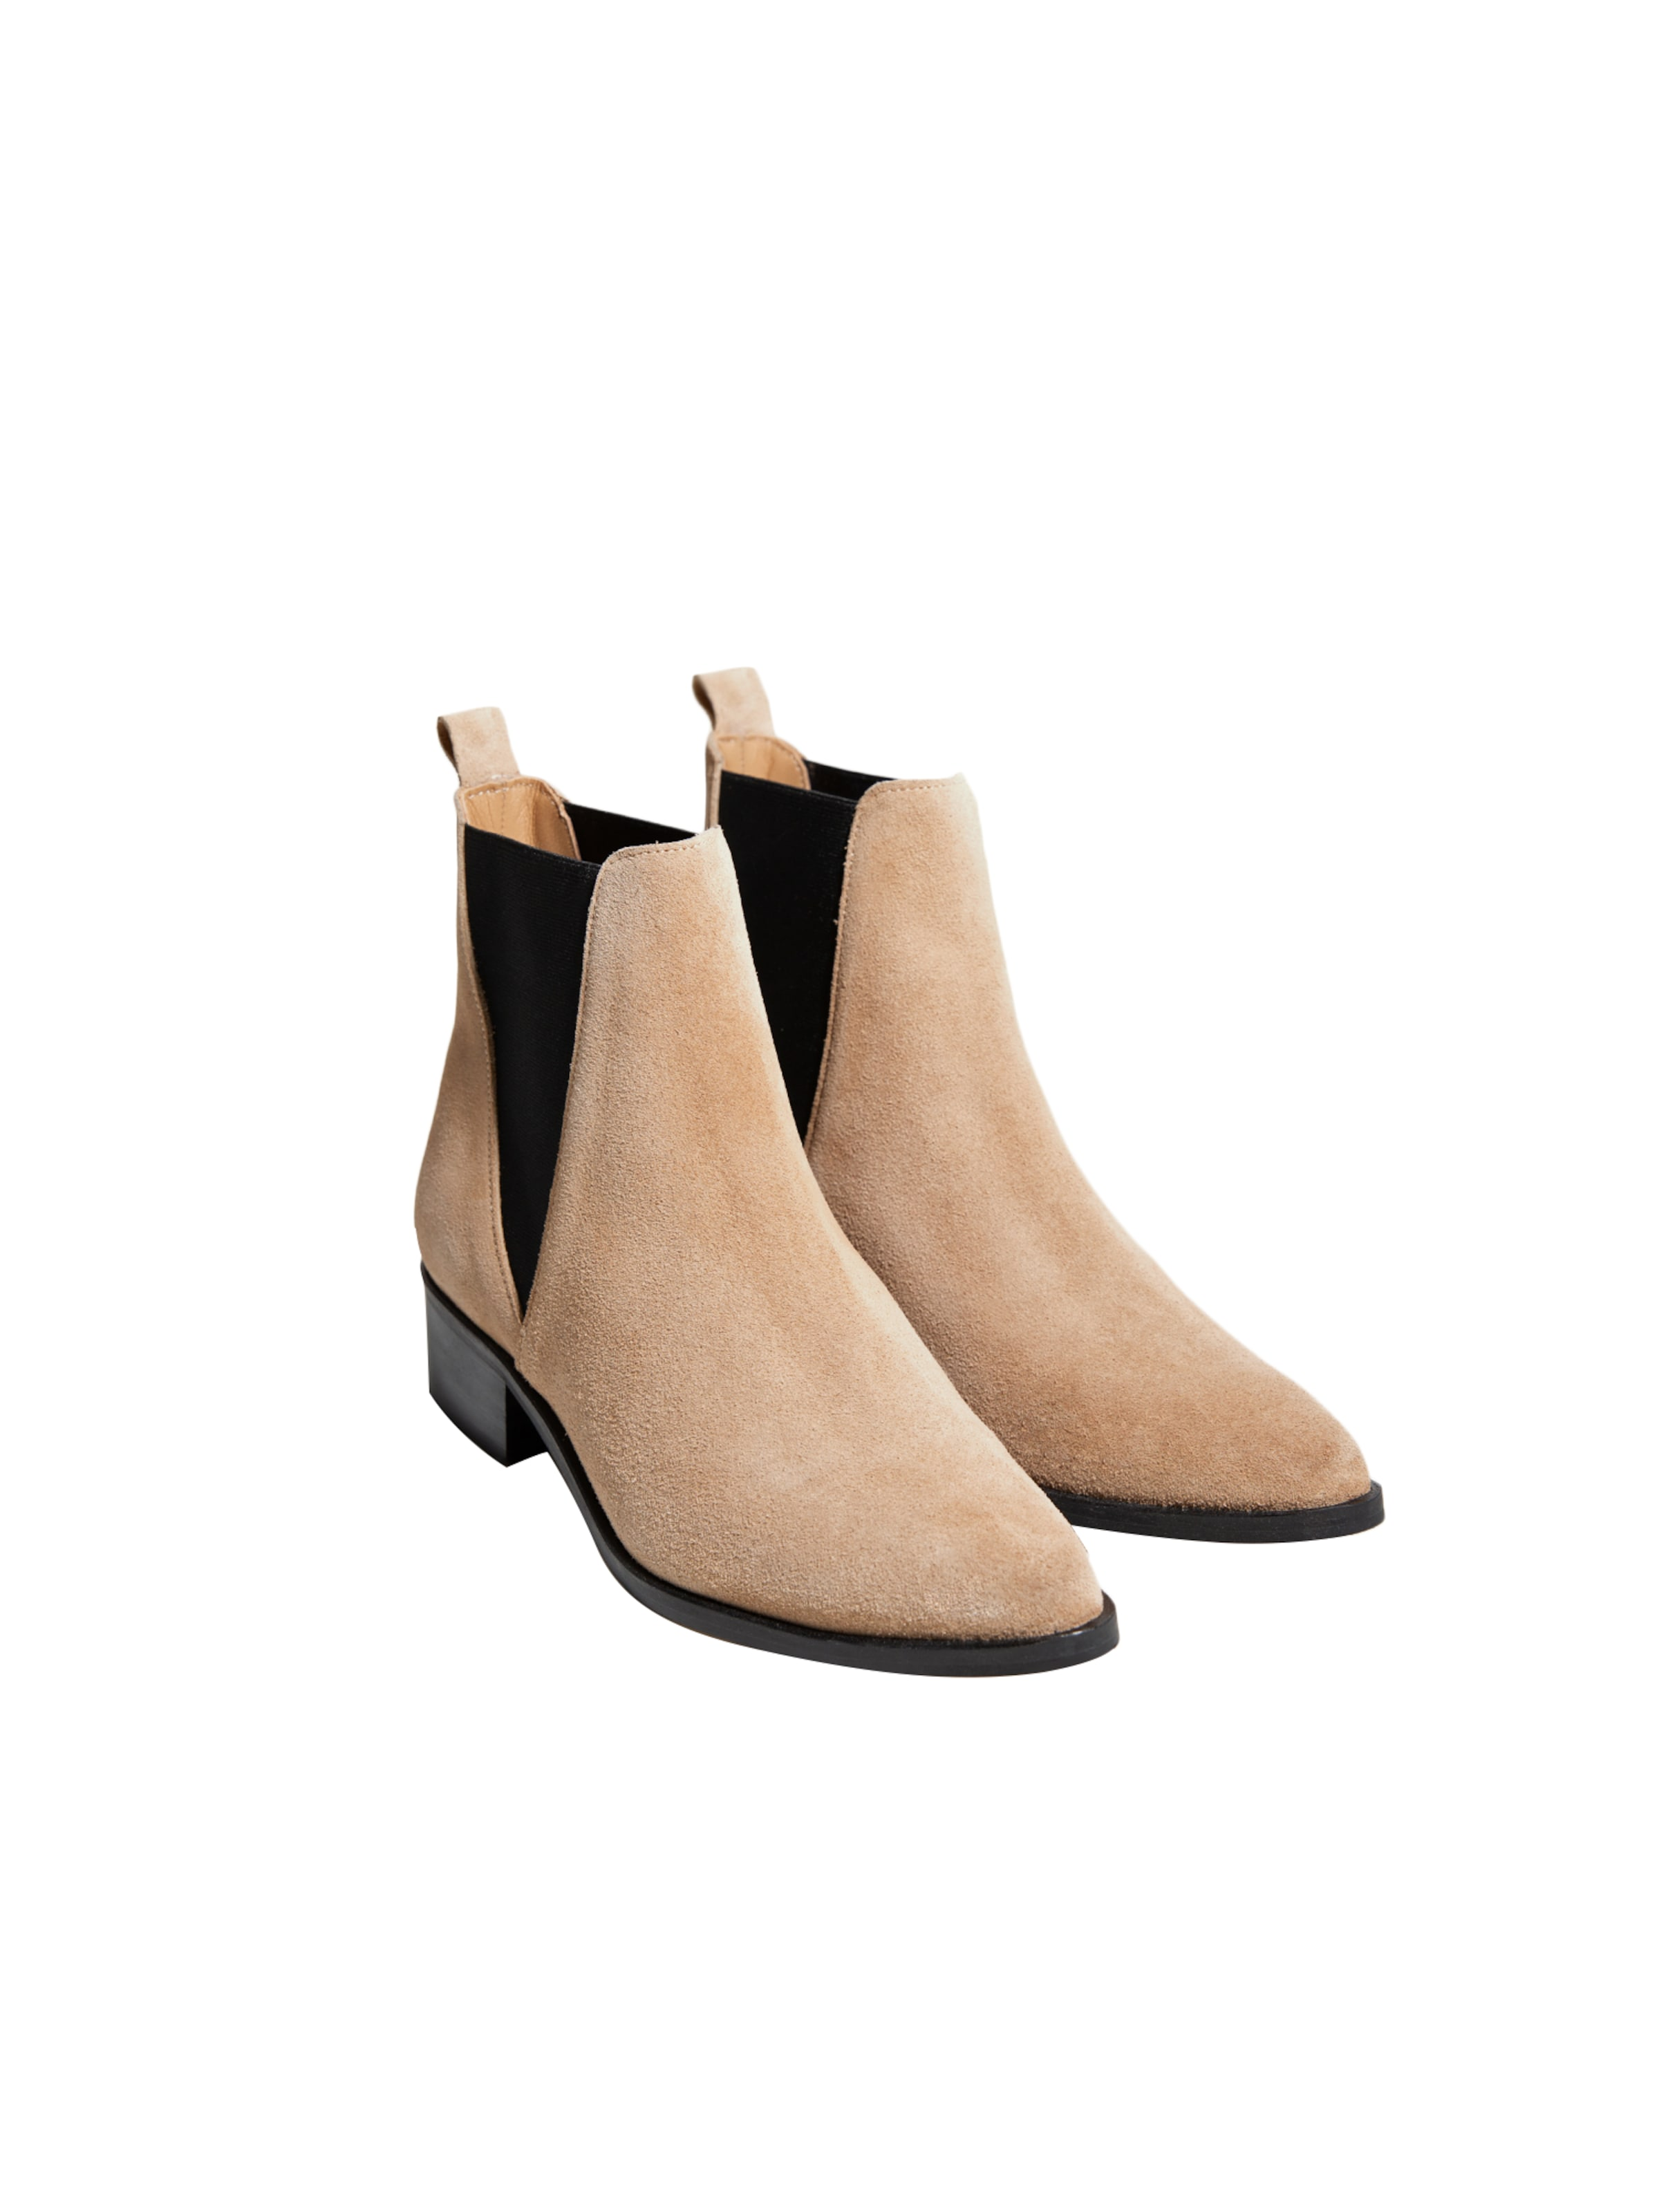 Beige Boots 'zora' Edited Chelsea En RAq3jL54